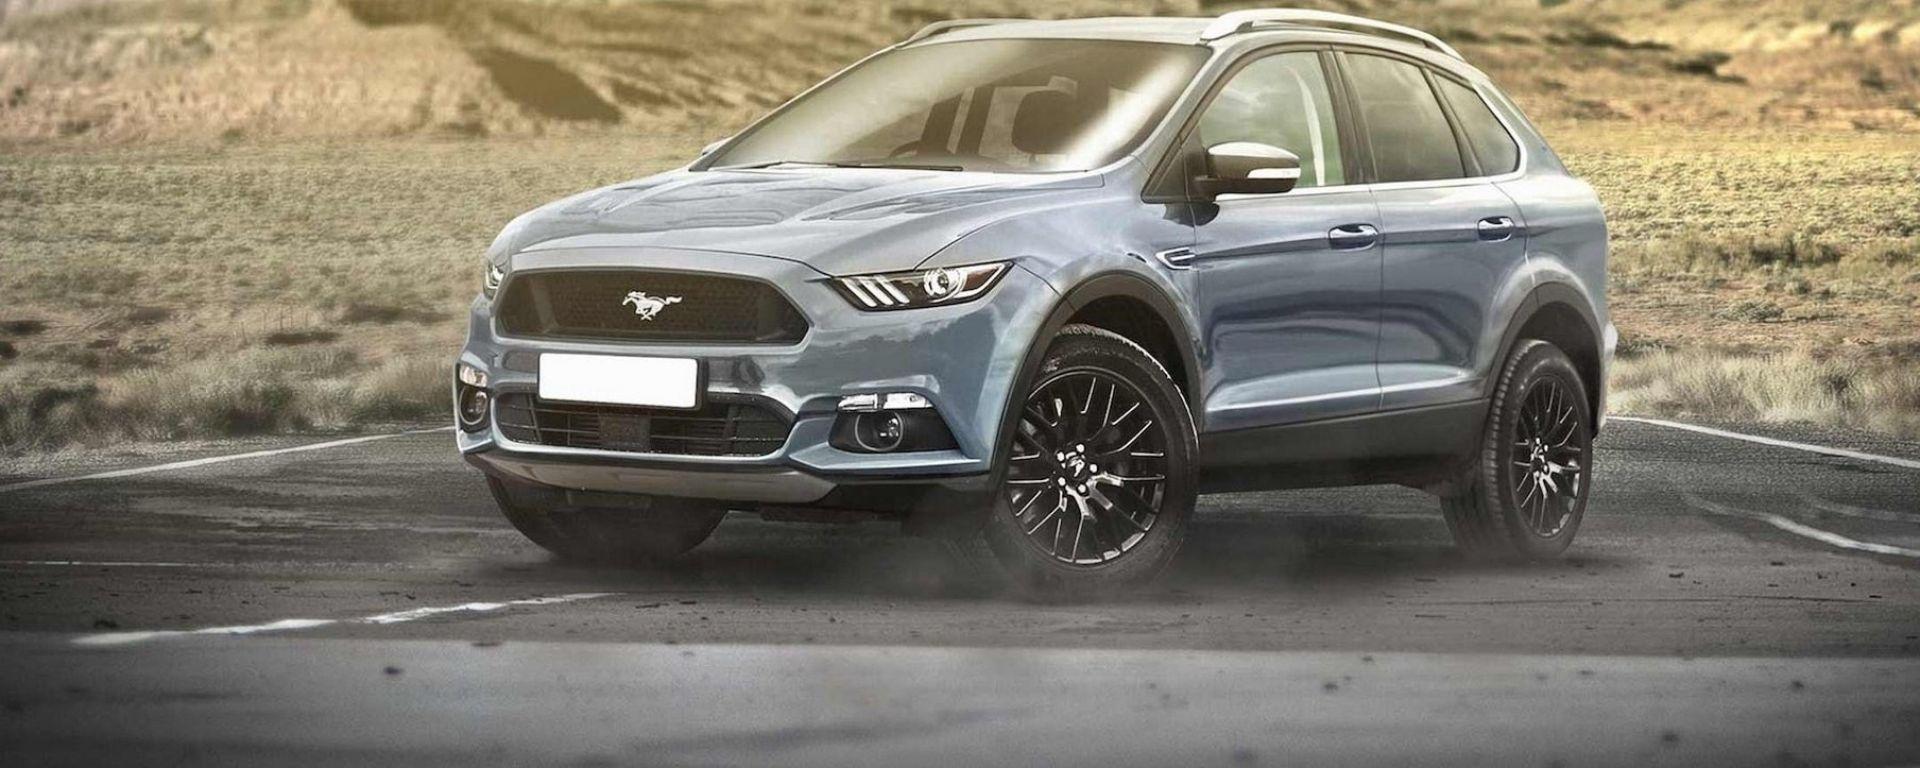 Ford Mach 1 Ev Nel 2020 Una Mustang Crossover A